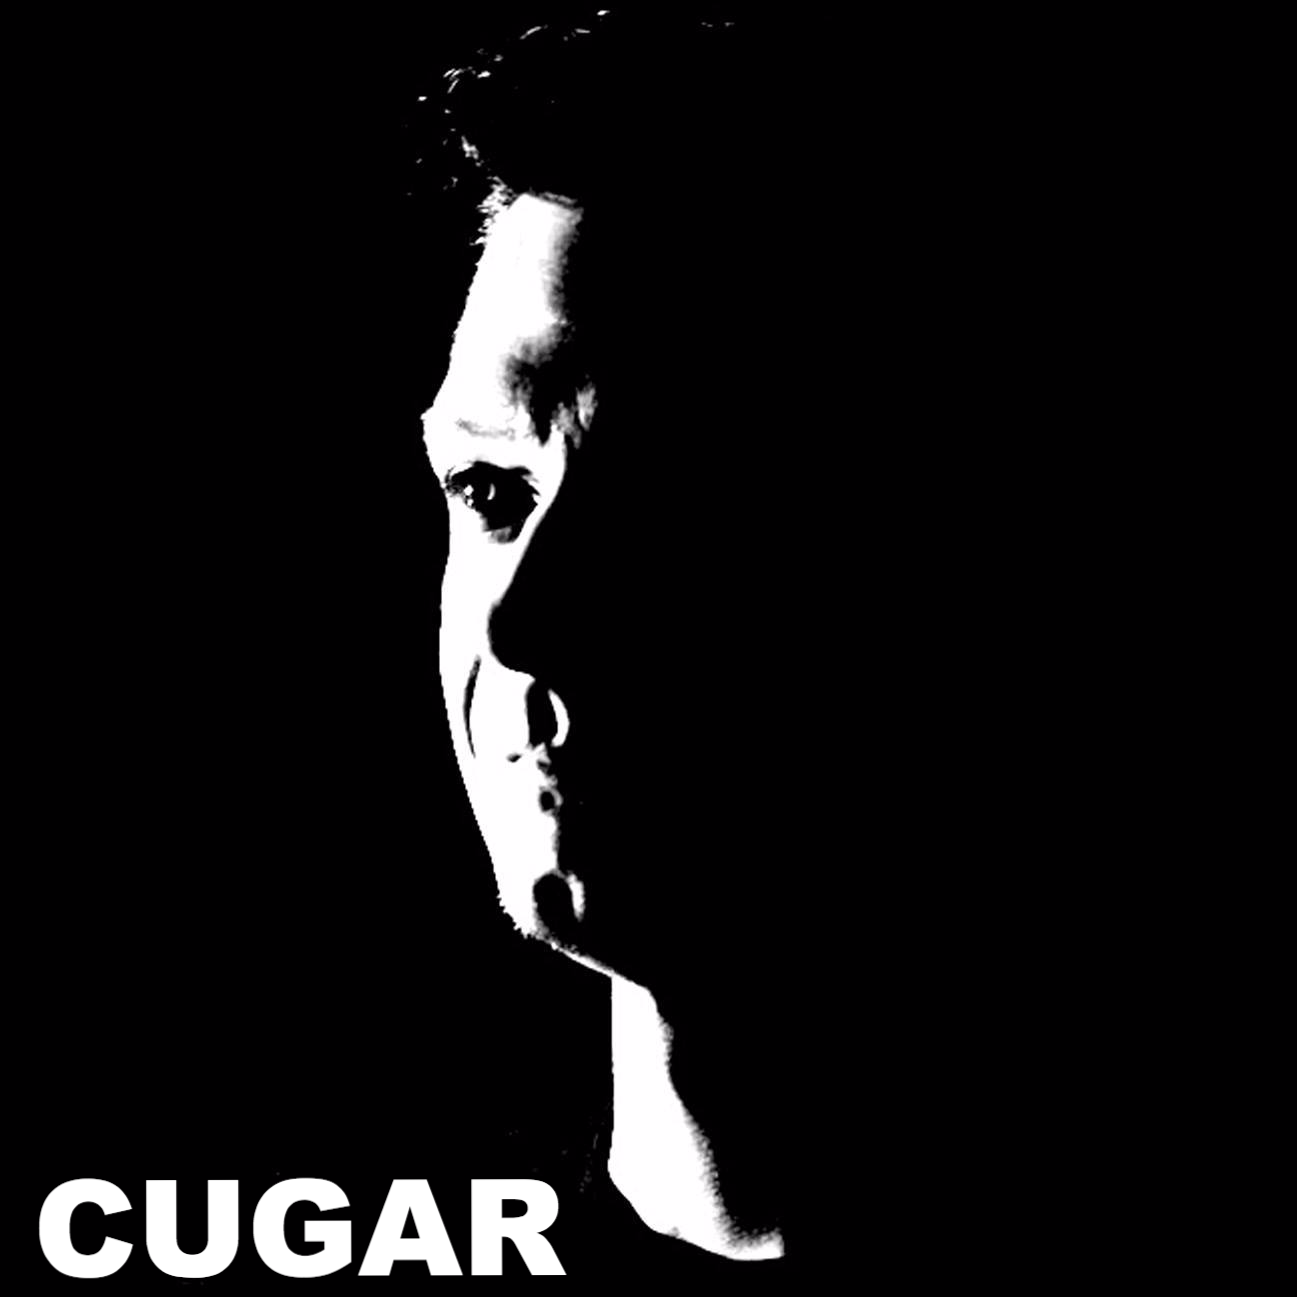 CUGAR ARTIST